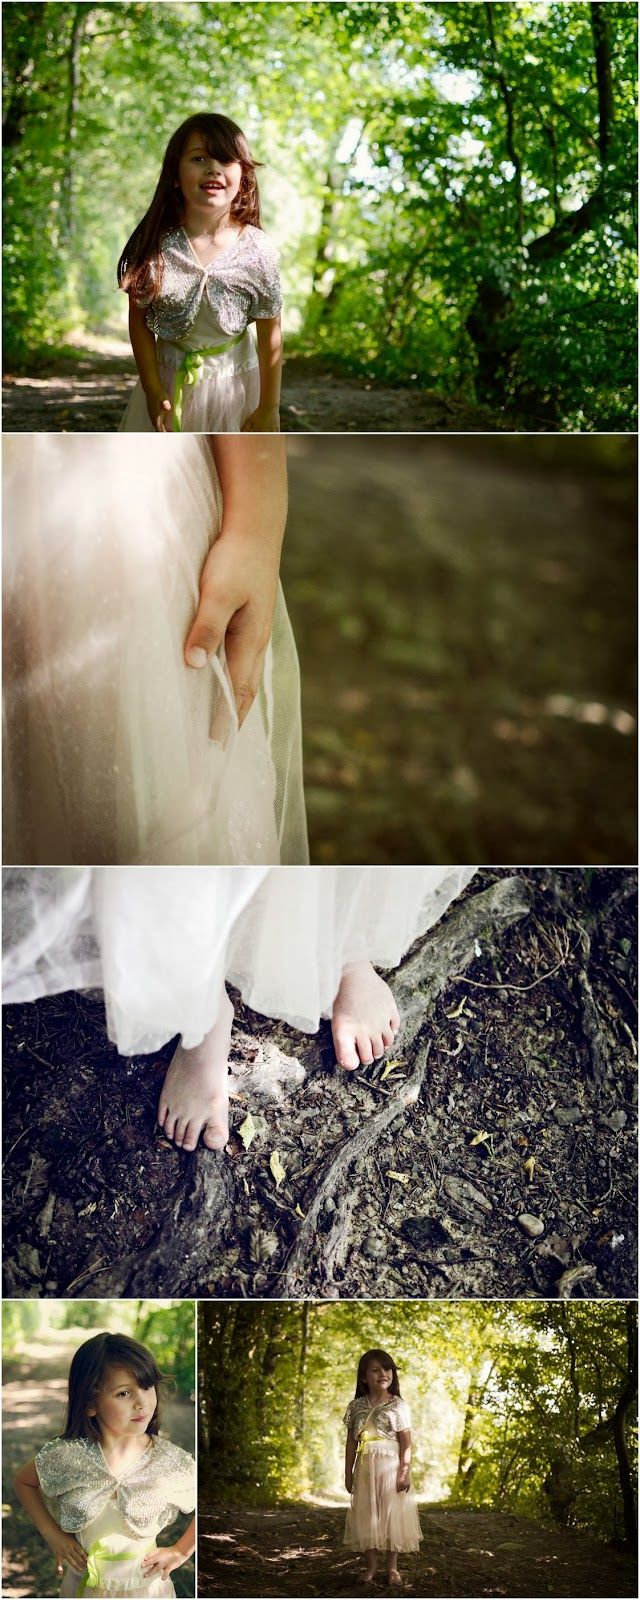 The little forest fairy - portrait child, photography, pastel, summer!